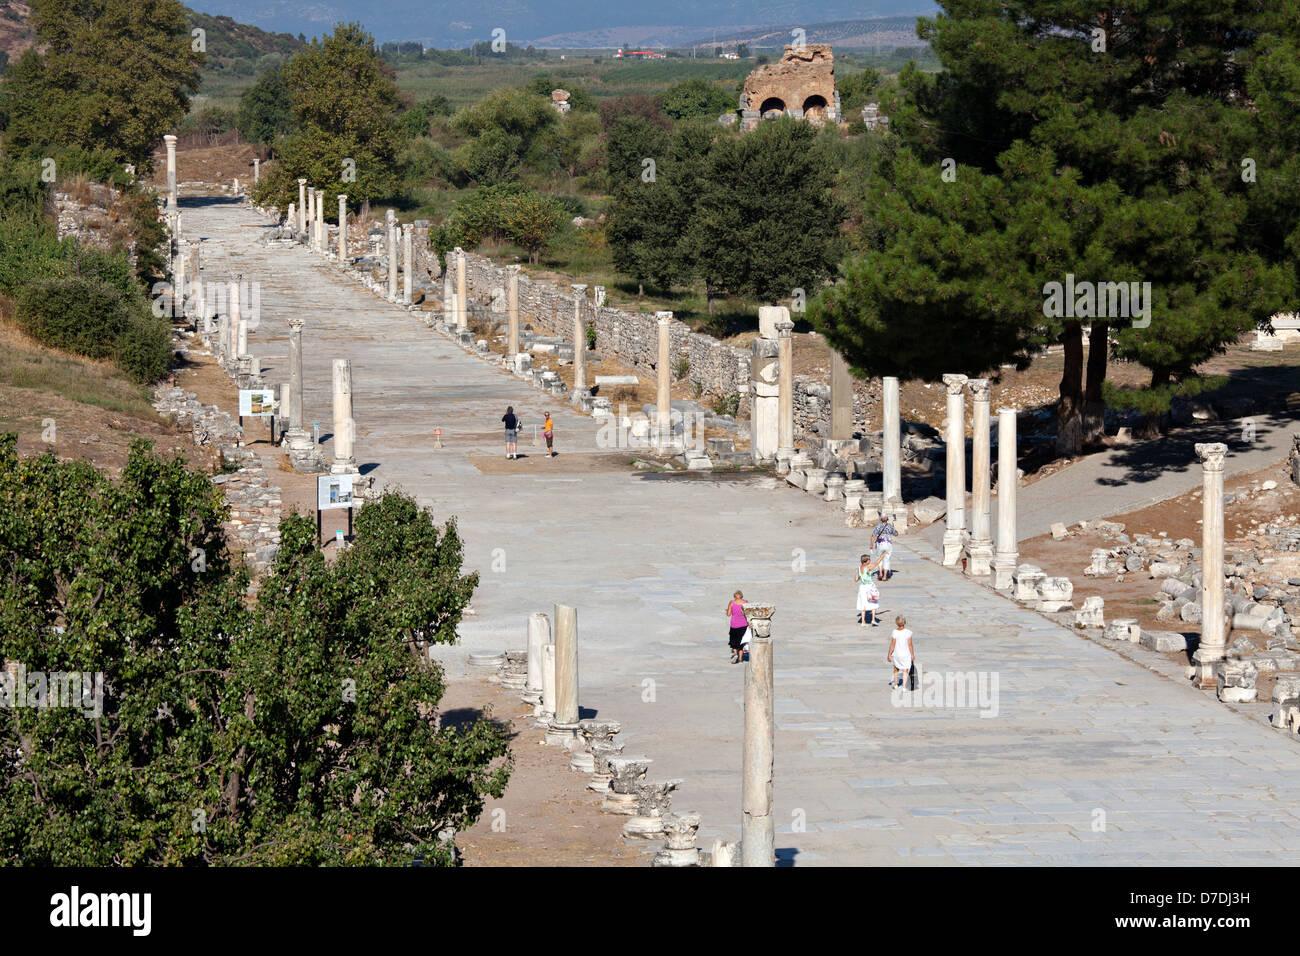 Horbour street in Ephesus, Izmir, Turkey - Stock Image